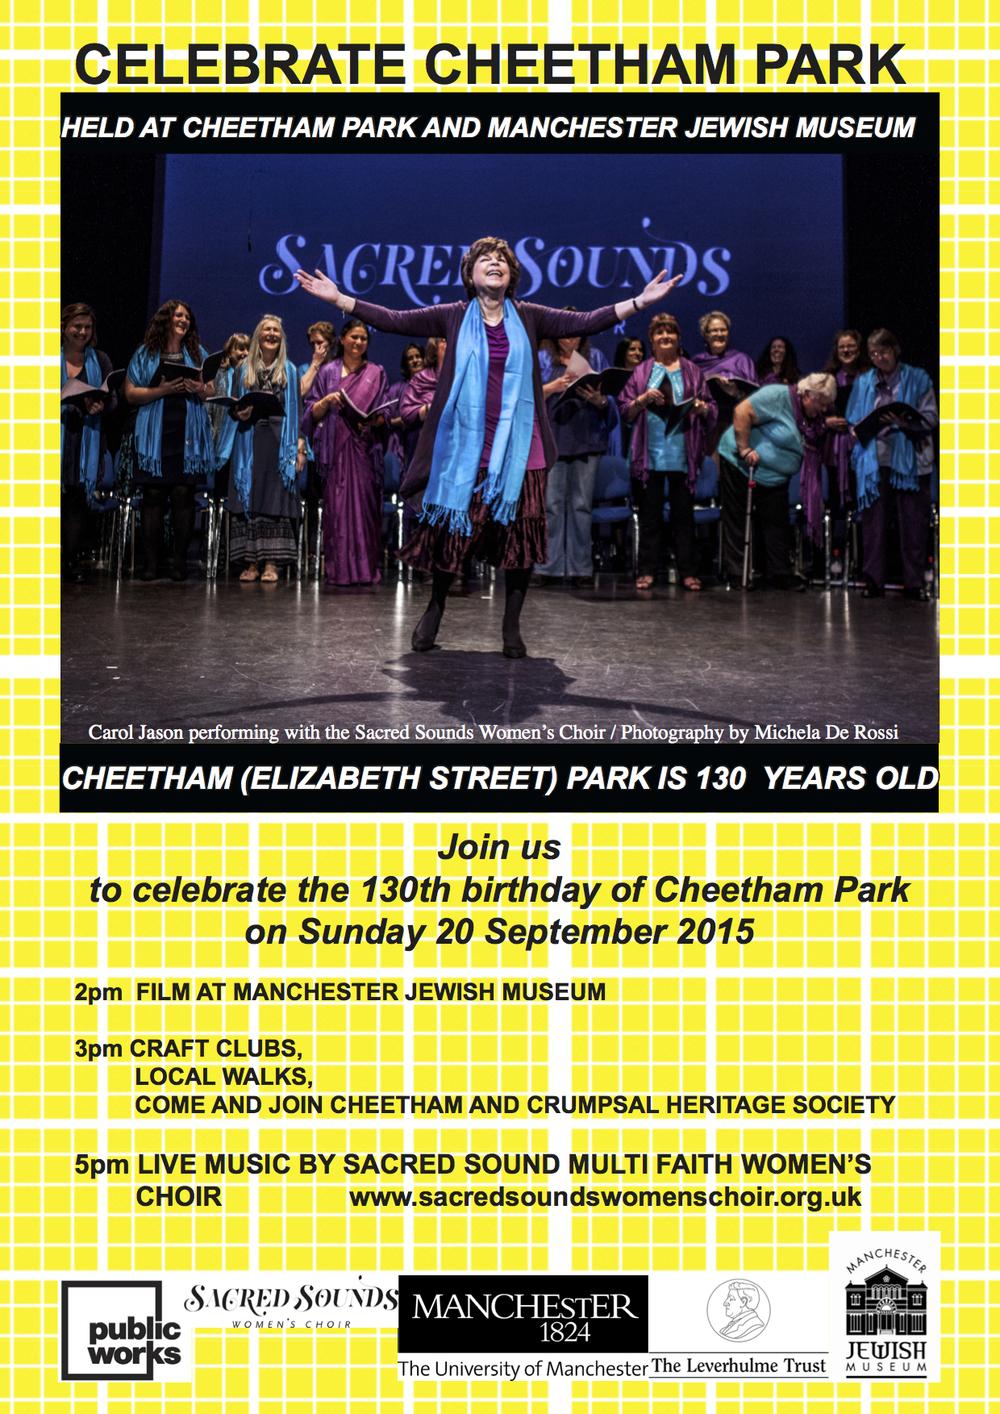 Celebrate Cheetham Park